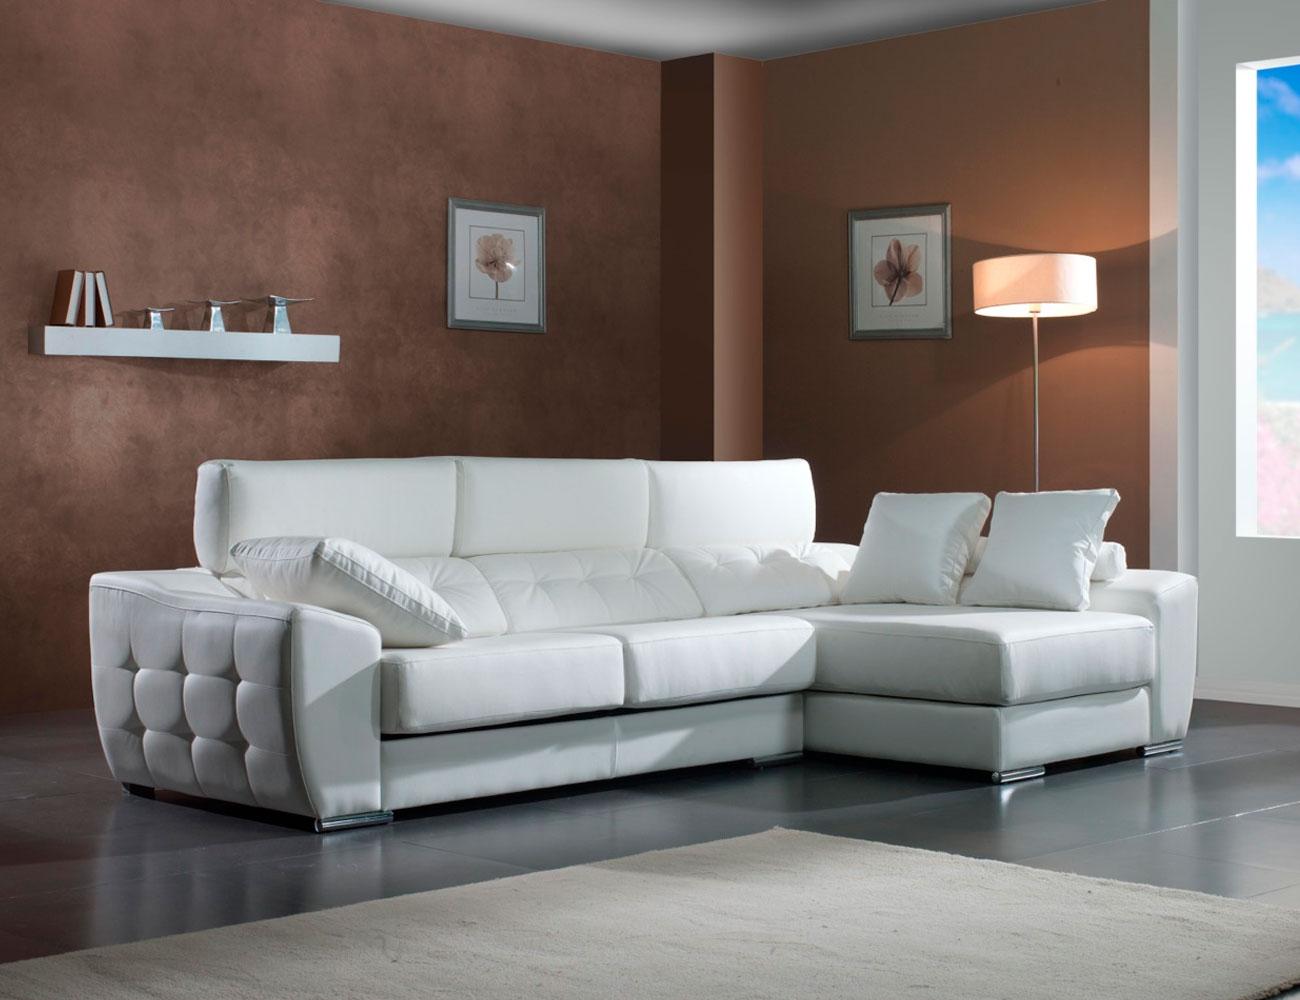 Sofa chaiselongue moderno capitone polipiel blanco 21